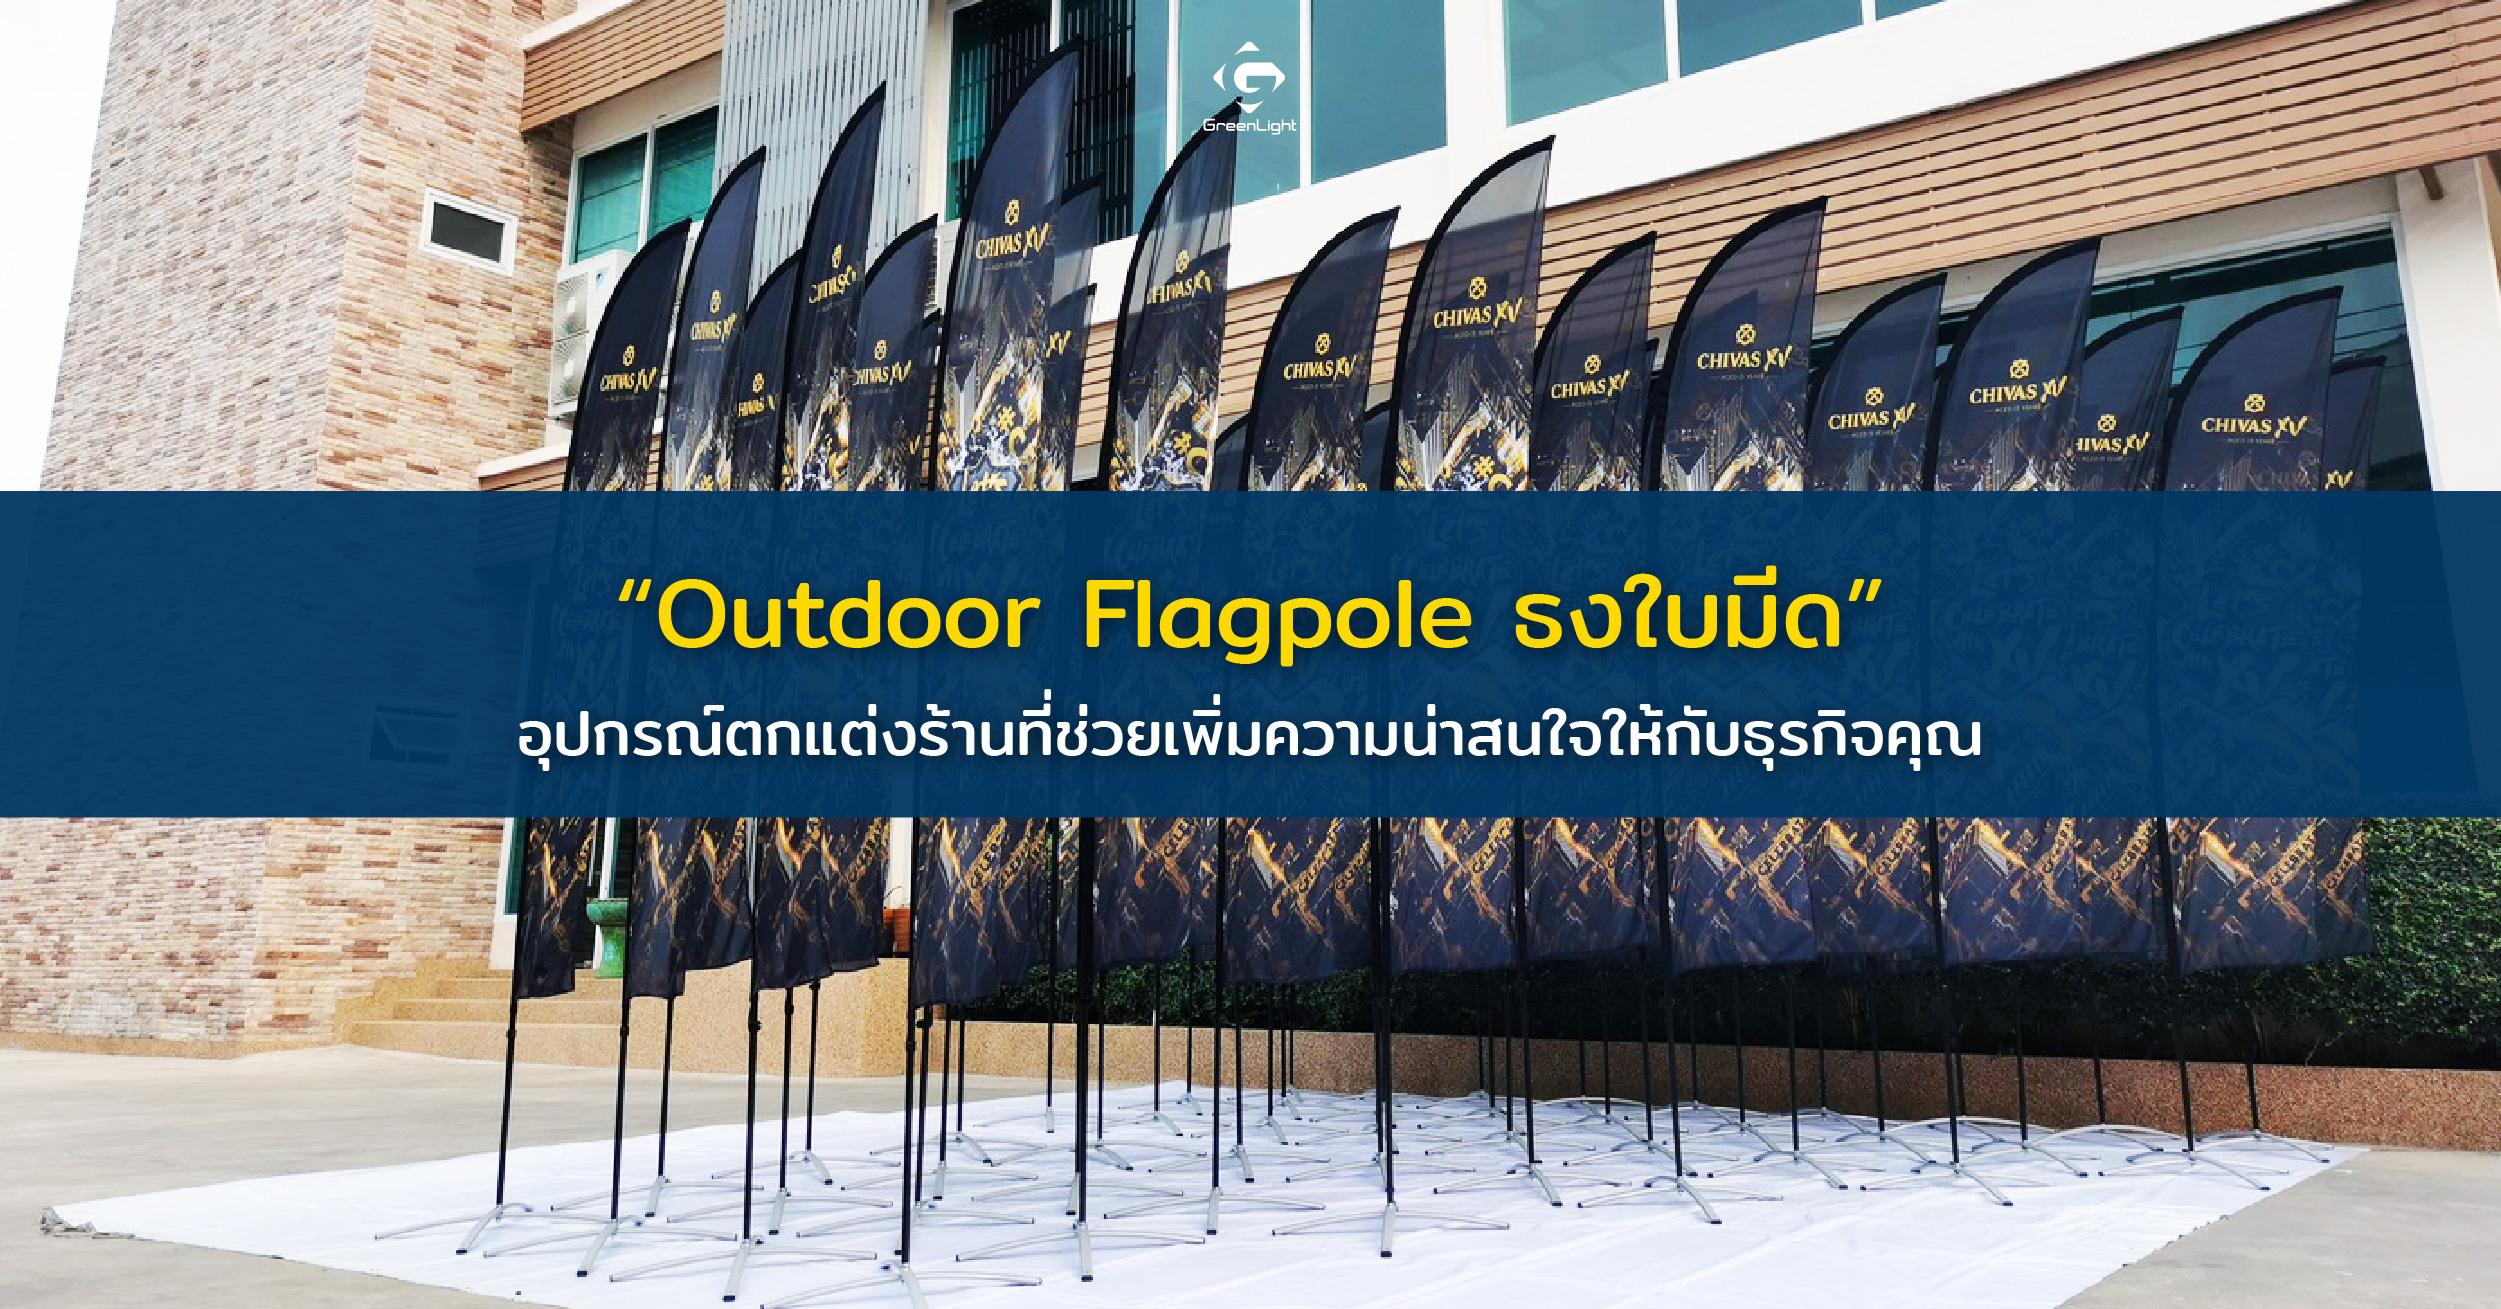 """Outdoor Flagpole ธงใบมีด""อุปกรณ์ตกแต่งหน้าร้านที่ช่วยเพิ่มความน่าสนใจให้กับธุรกิจคุณ"